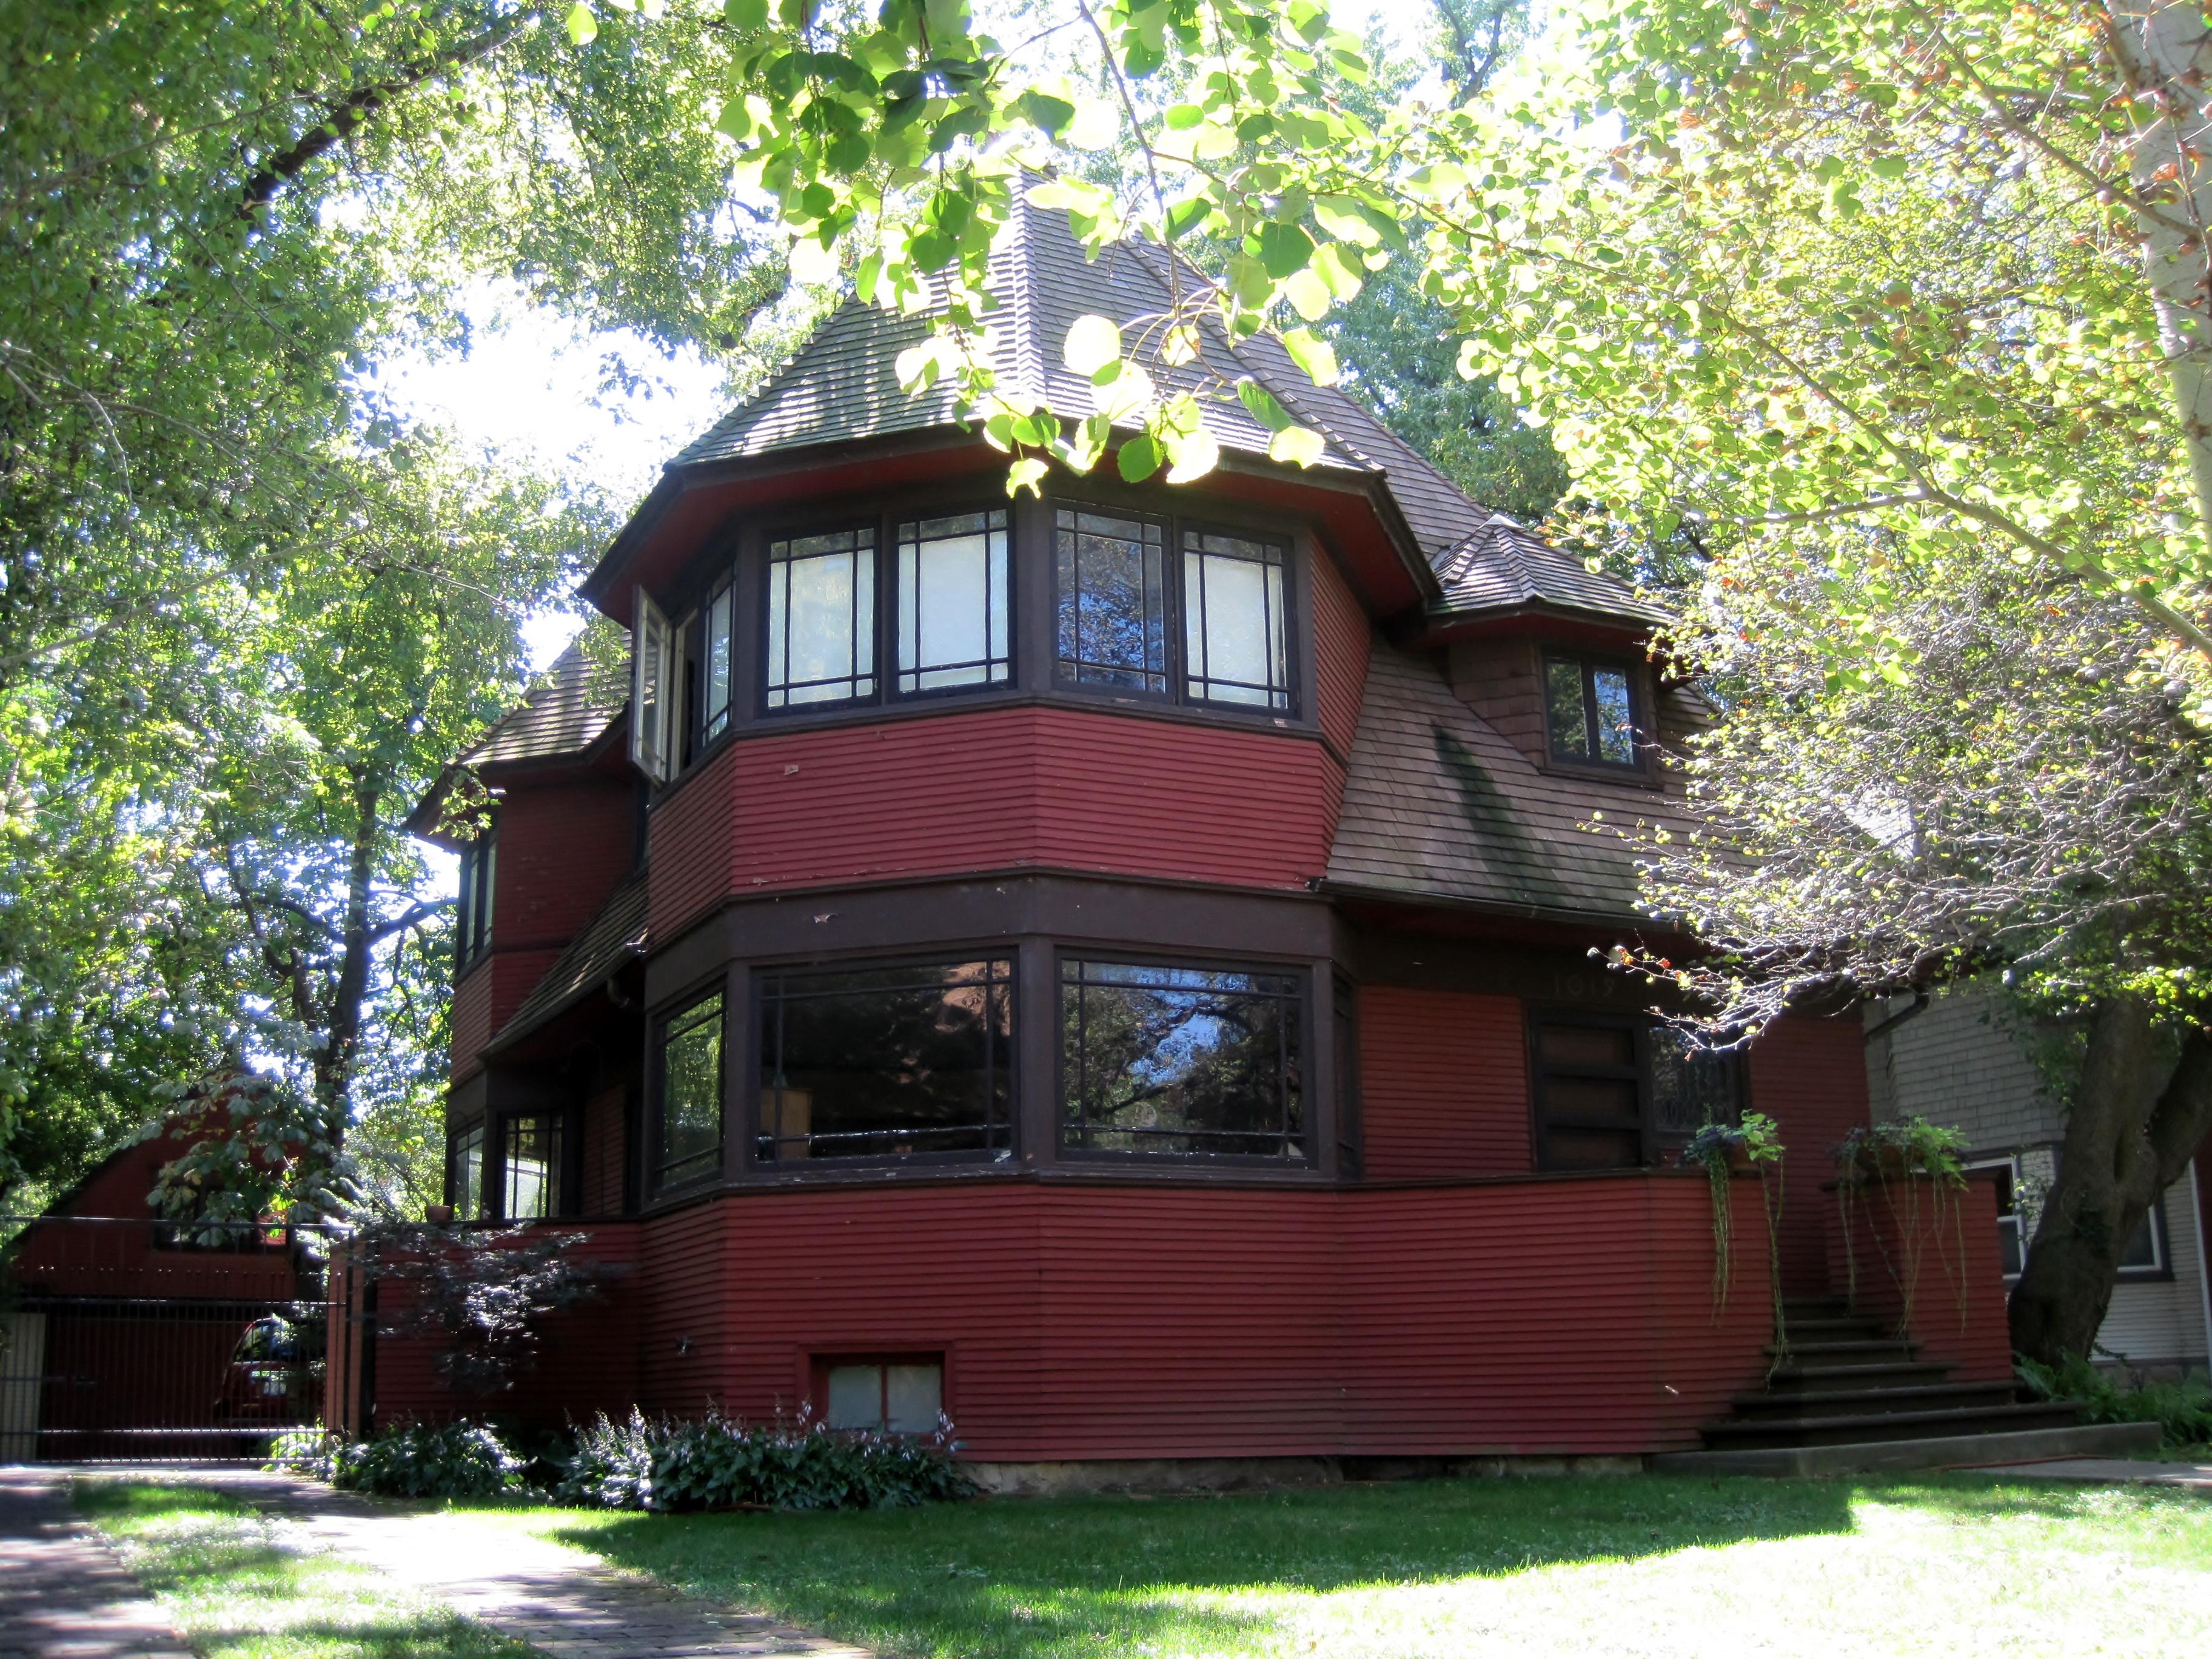 File:Robert P. Parker House (7417325020).jpg - Wikimedia Commons